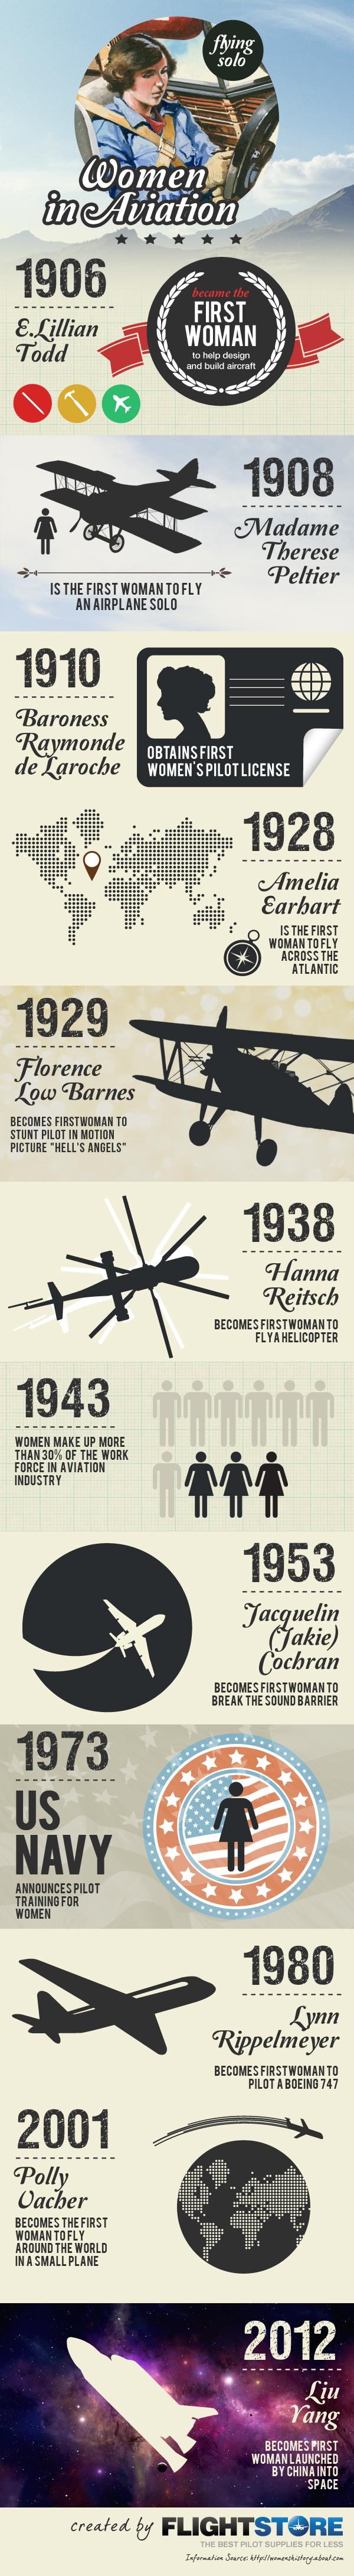 women-in-aviation-history_52644985b8c5c